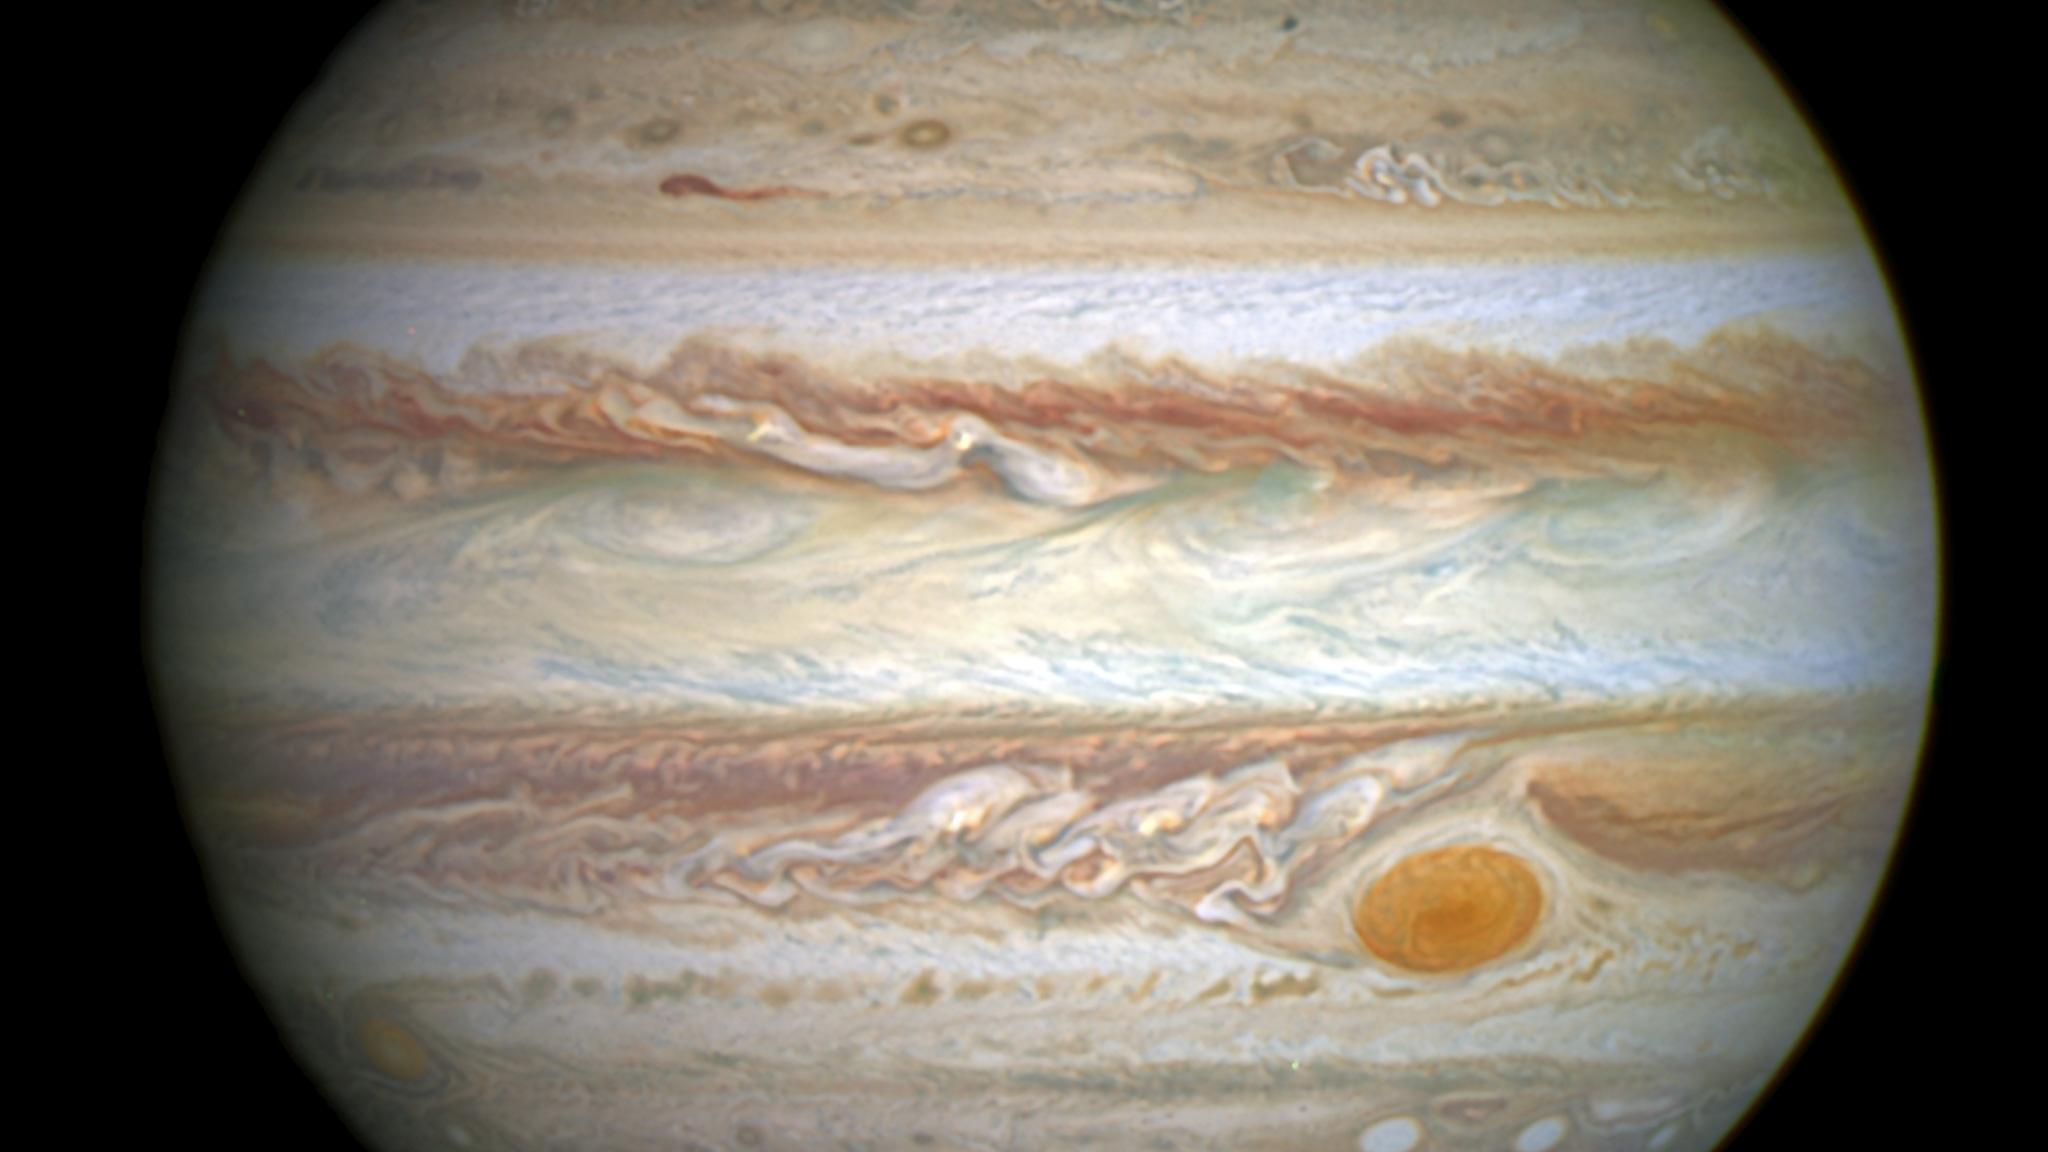 Zentraler Bereich des Planeten Jupiter, Aufnahme des Hubble Space Teleskops, 2014, NASA